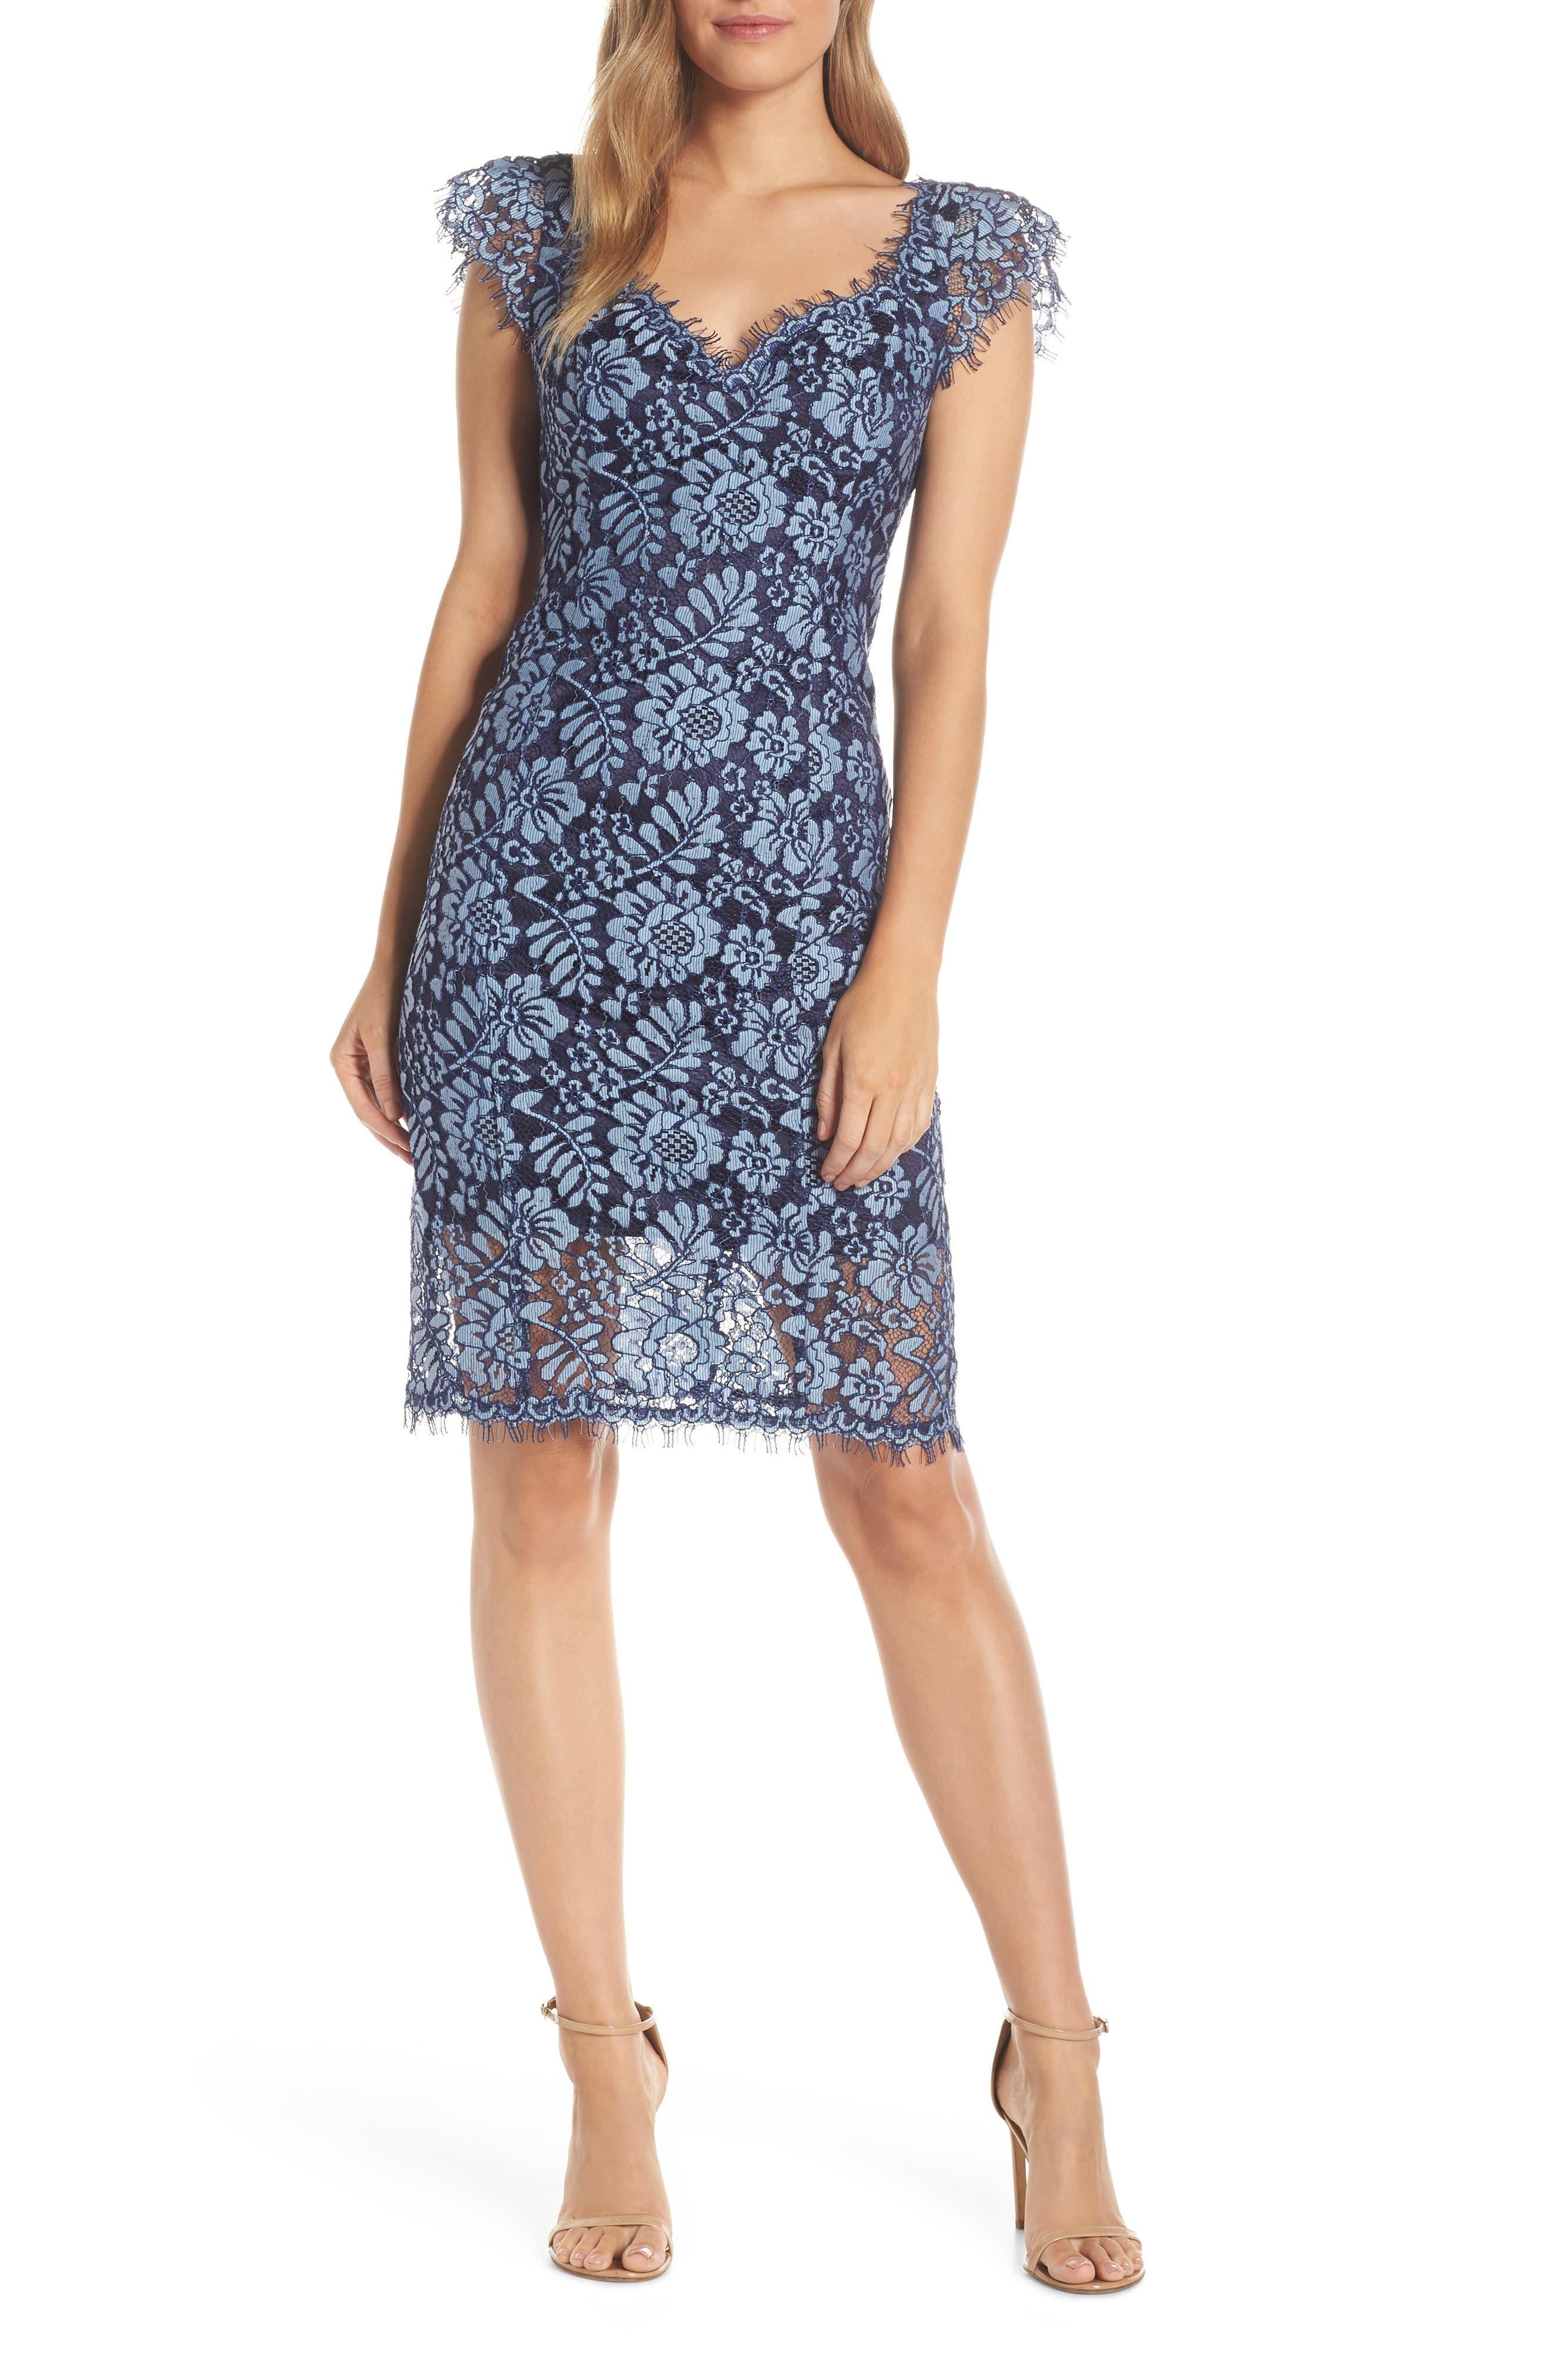 ELIZA J,                             Floral Lace Sheath Dress,                             Main thumbnail 1, color,                             NAVY